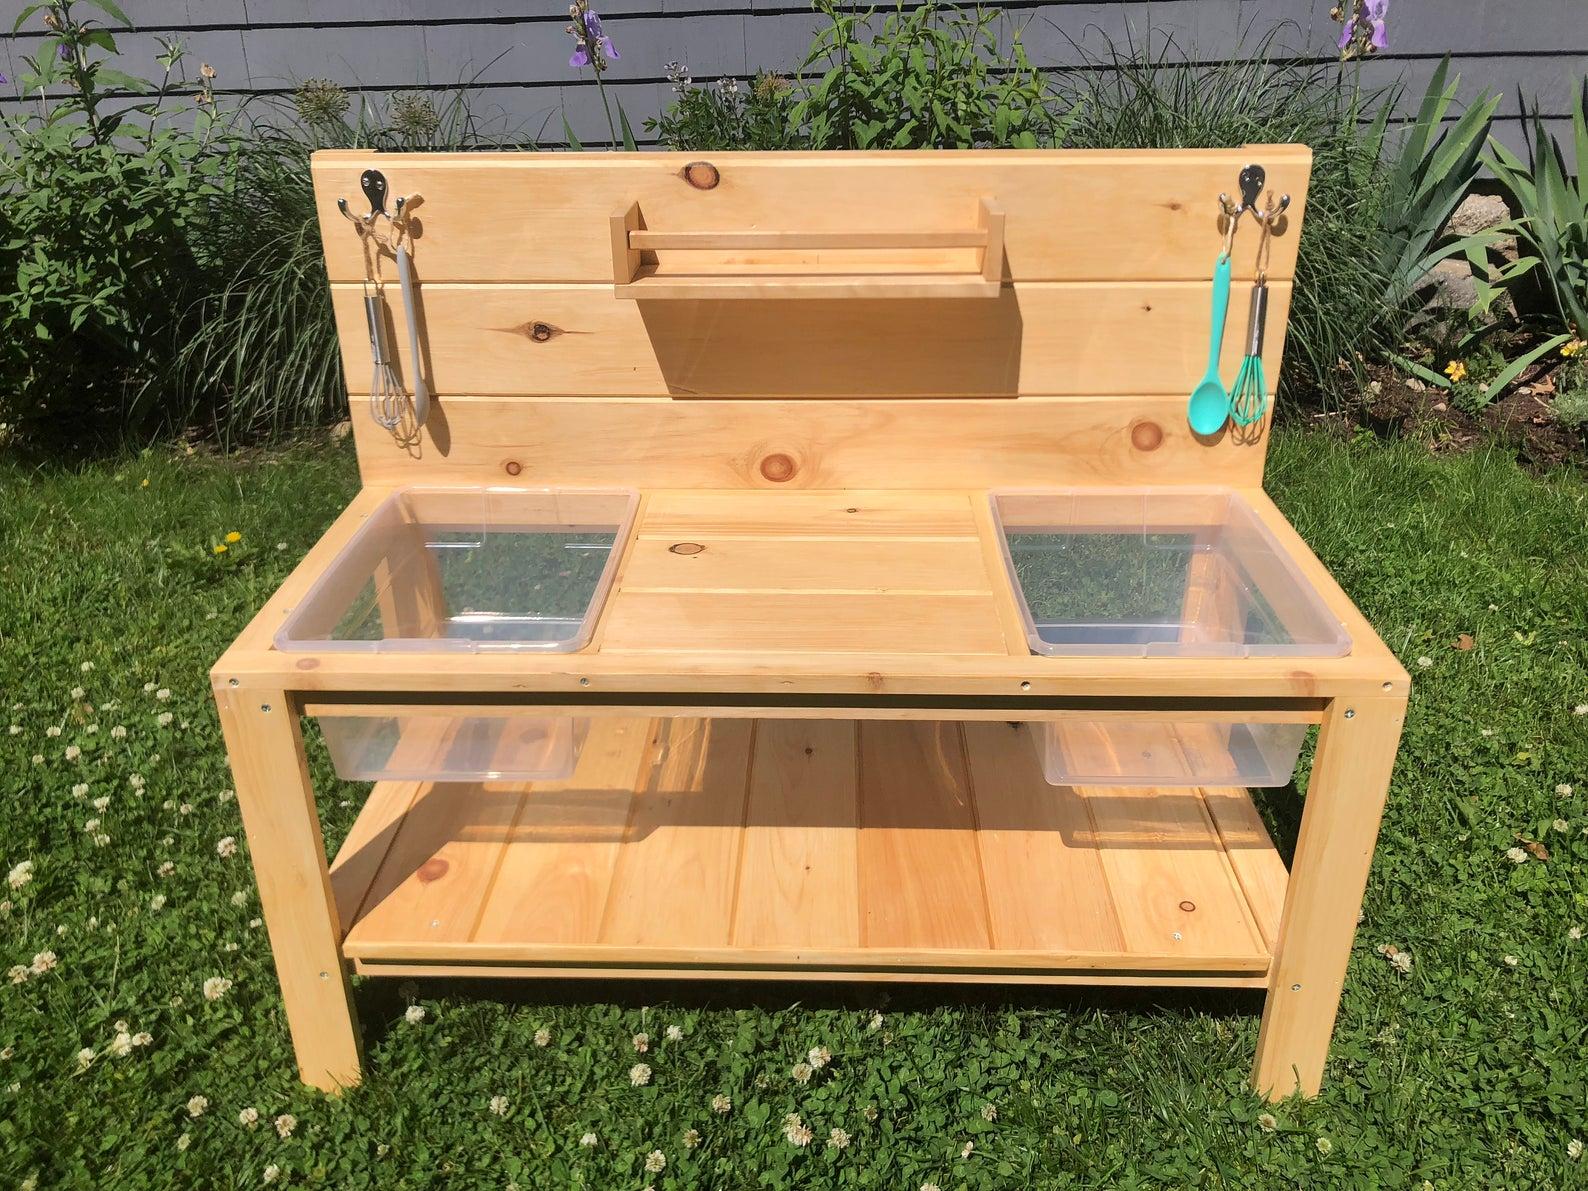 MonarchStudioShop double sink mud kitchen